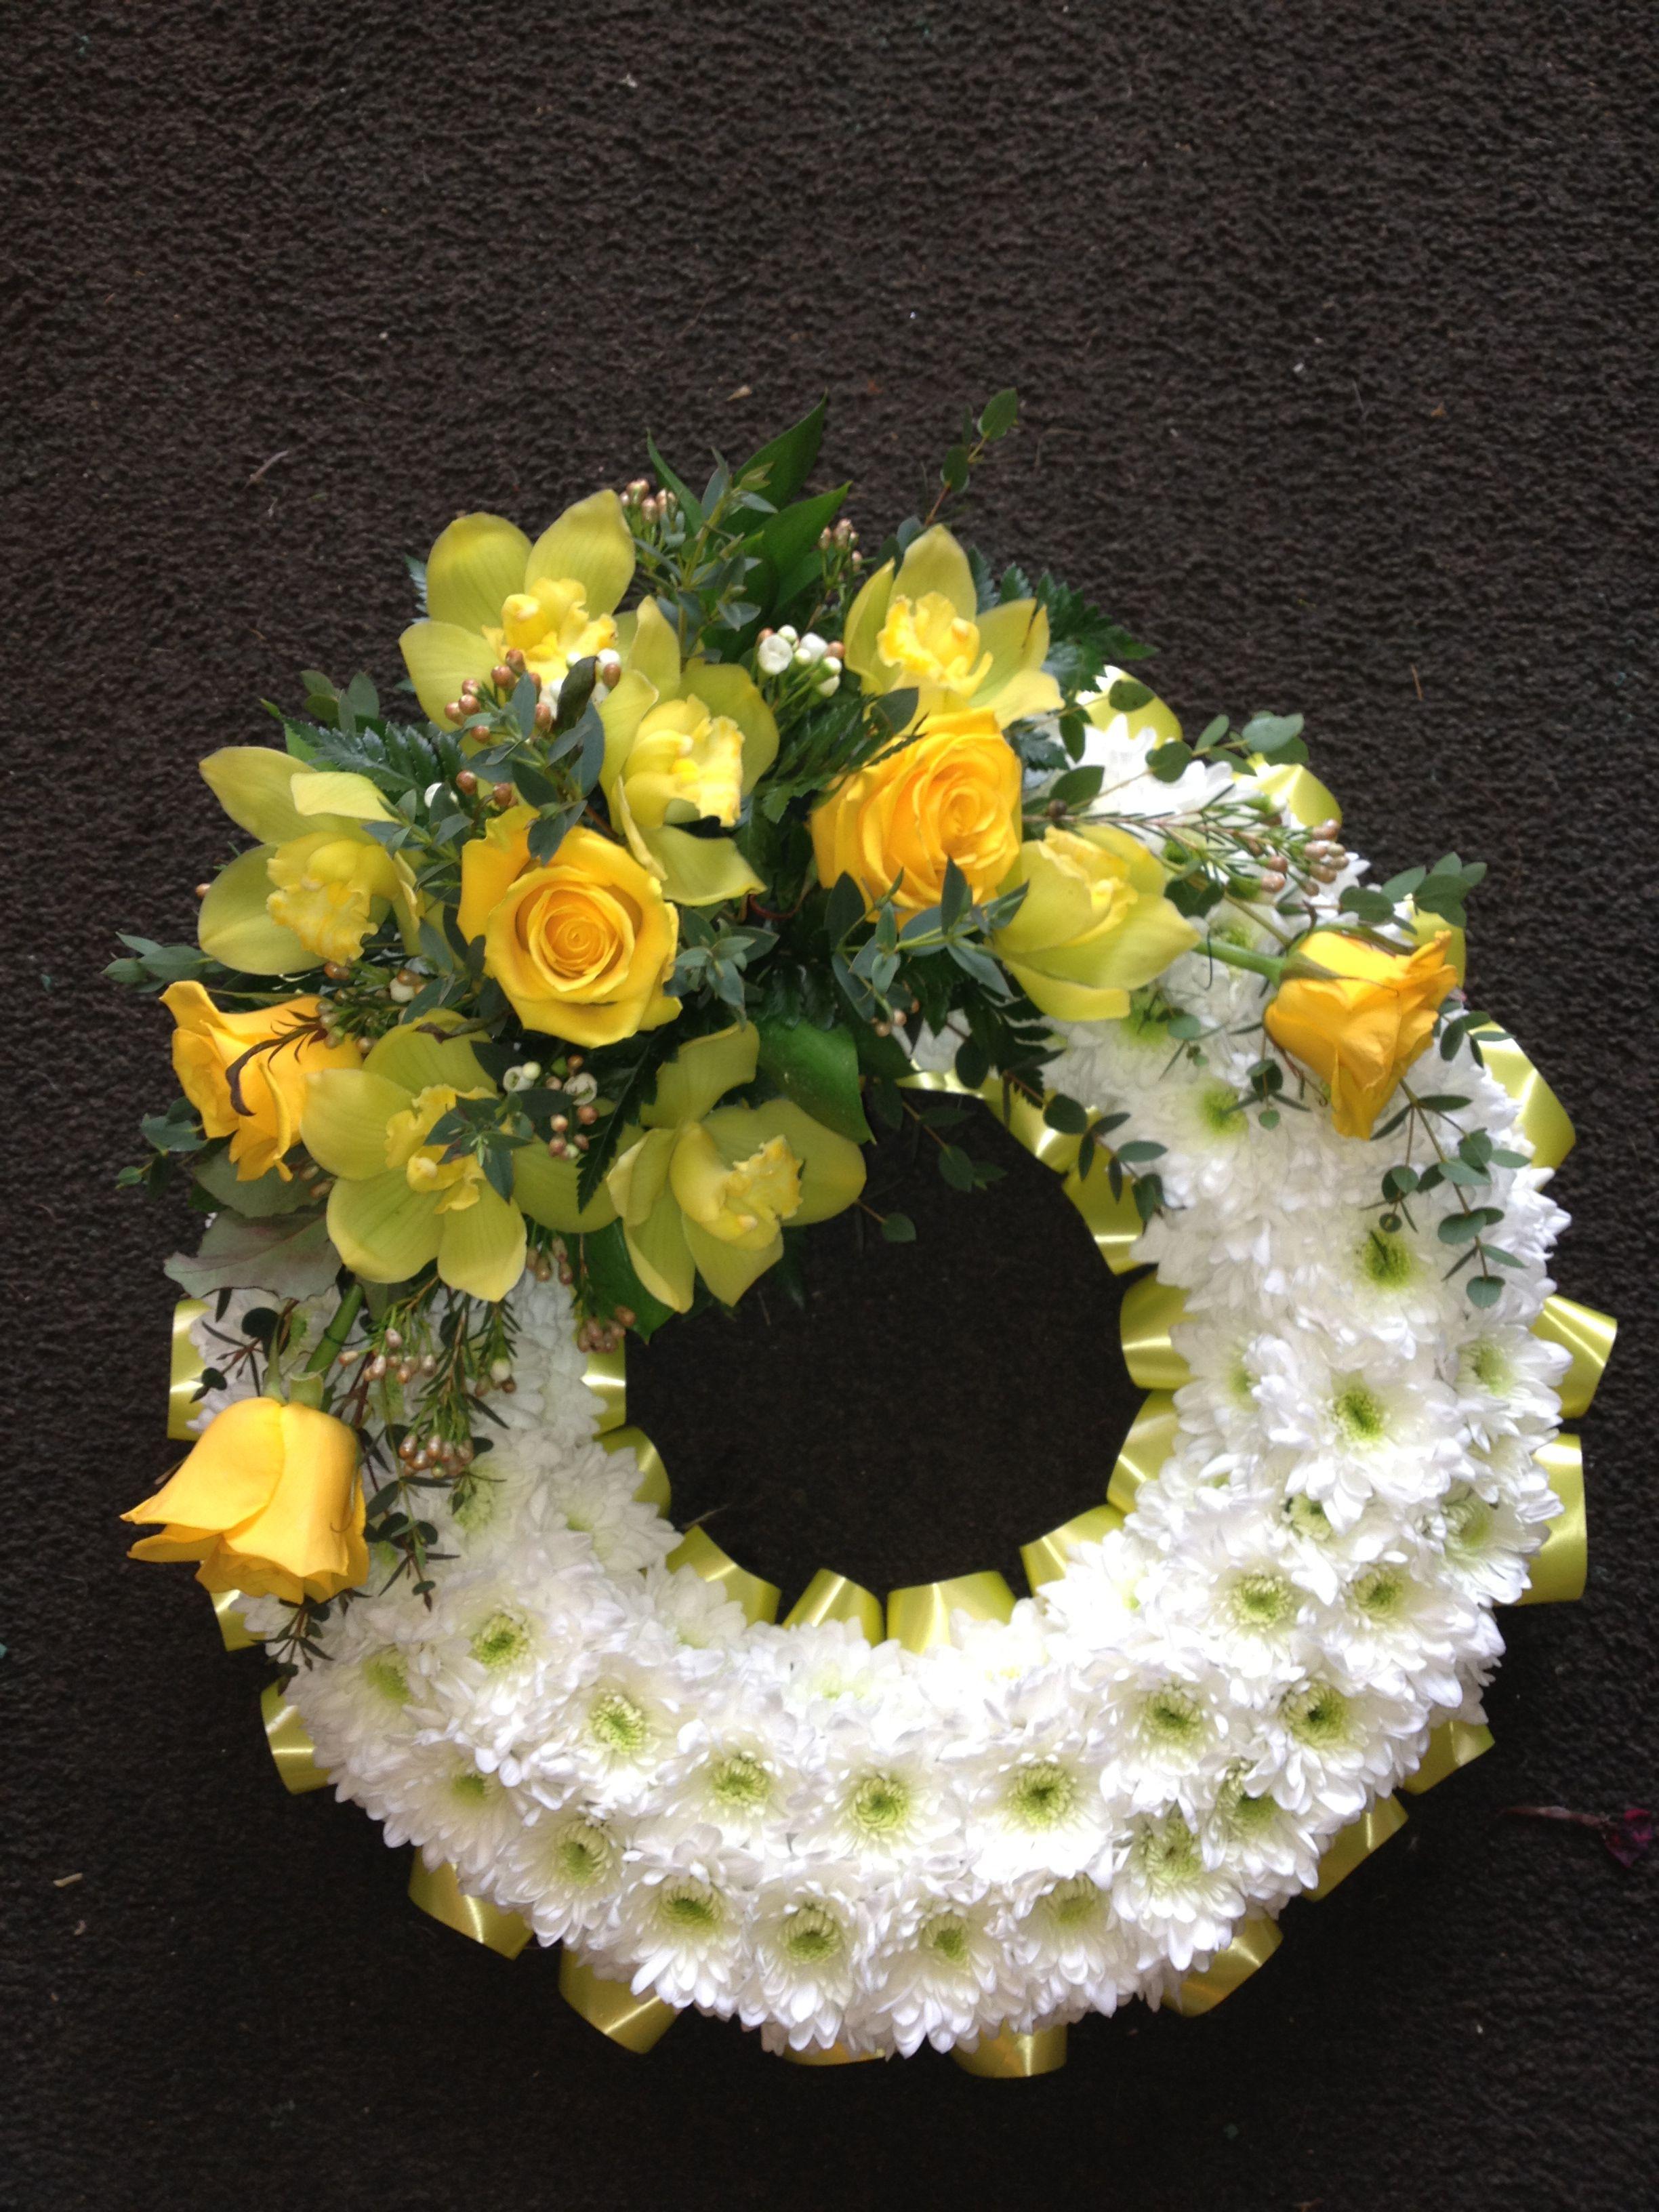 Funeral flowers blocked funeral tribute flowers verty funeral flowers blocked funeral tribute flowers izmirmasajfo Images